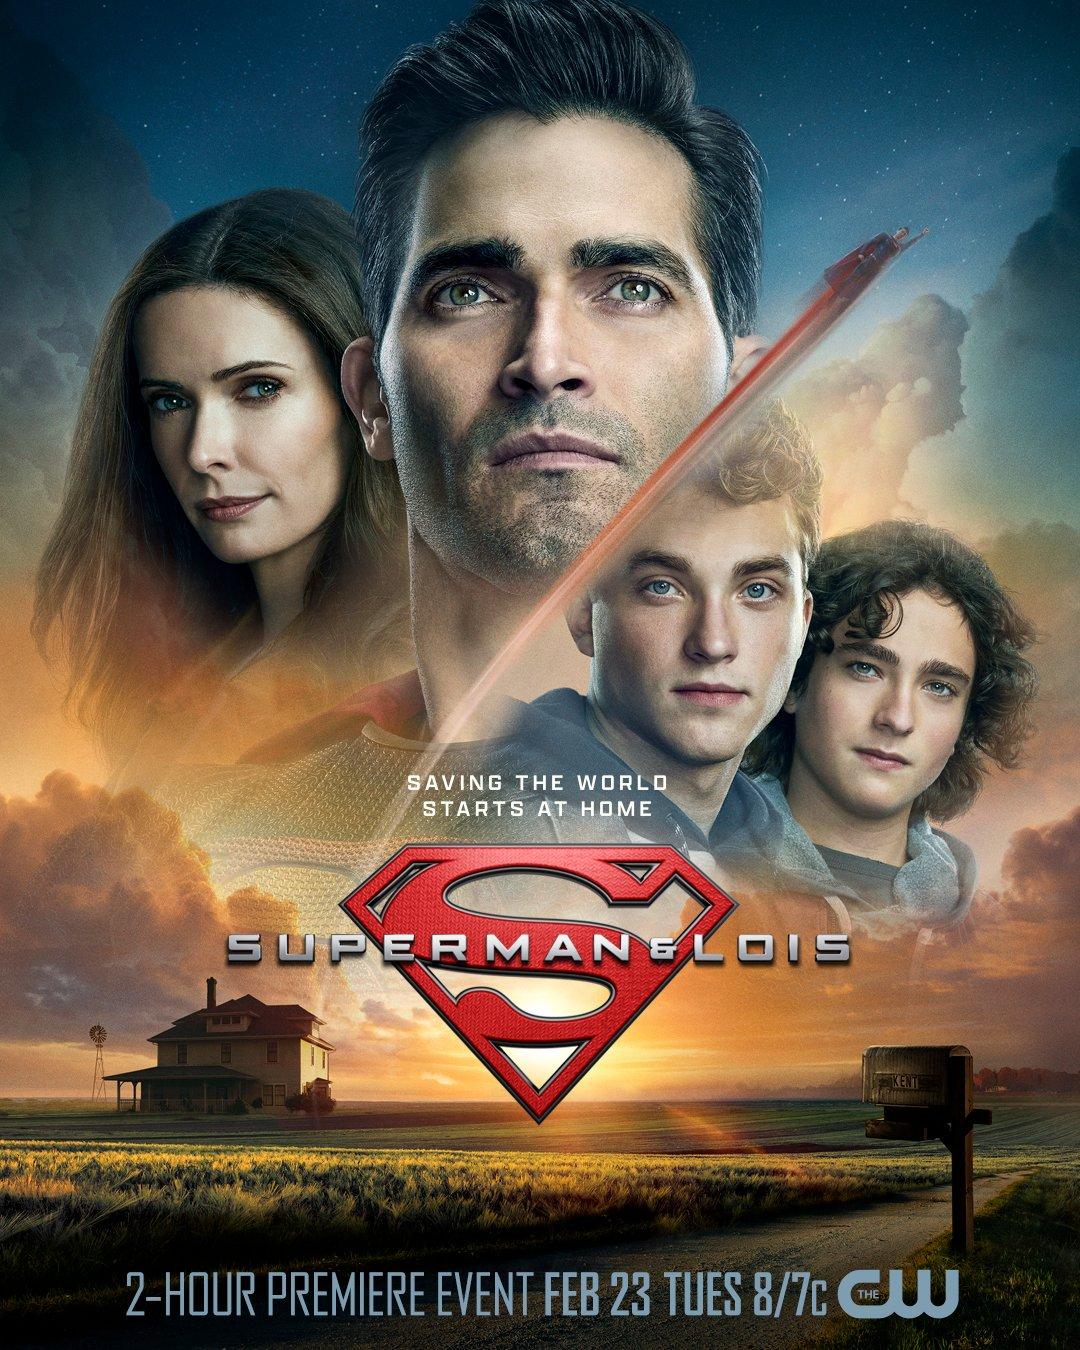 Los Kent en el póster de Superman & Lois. Imagen: Superman and Lois Twitter (@cwsupermanandlois).